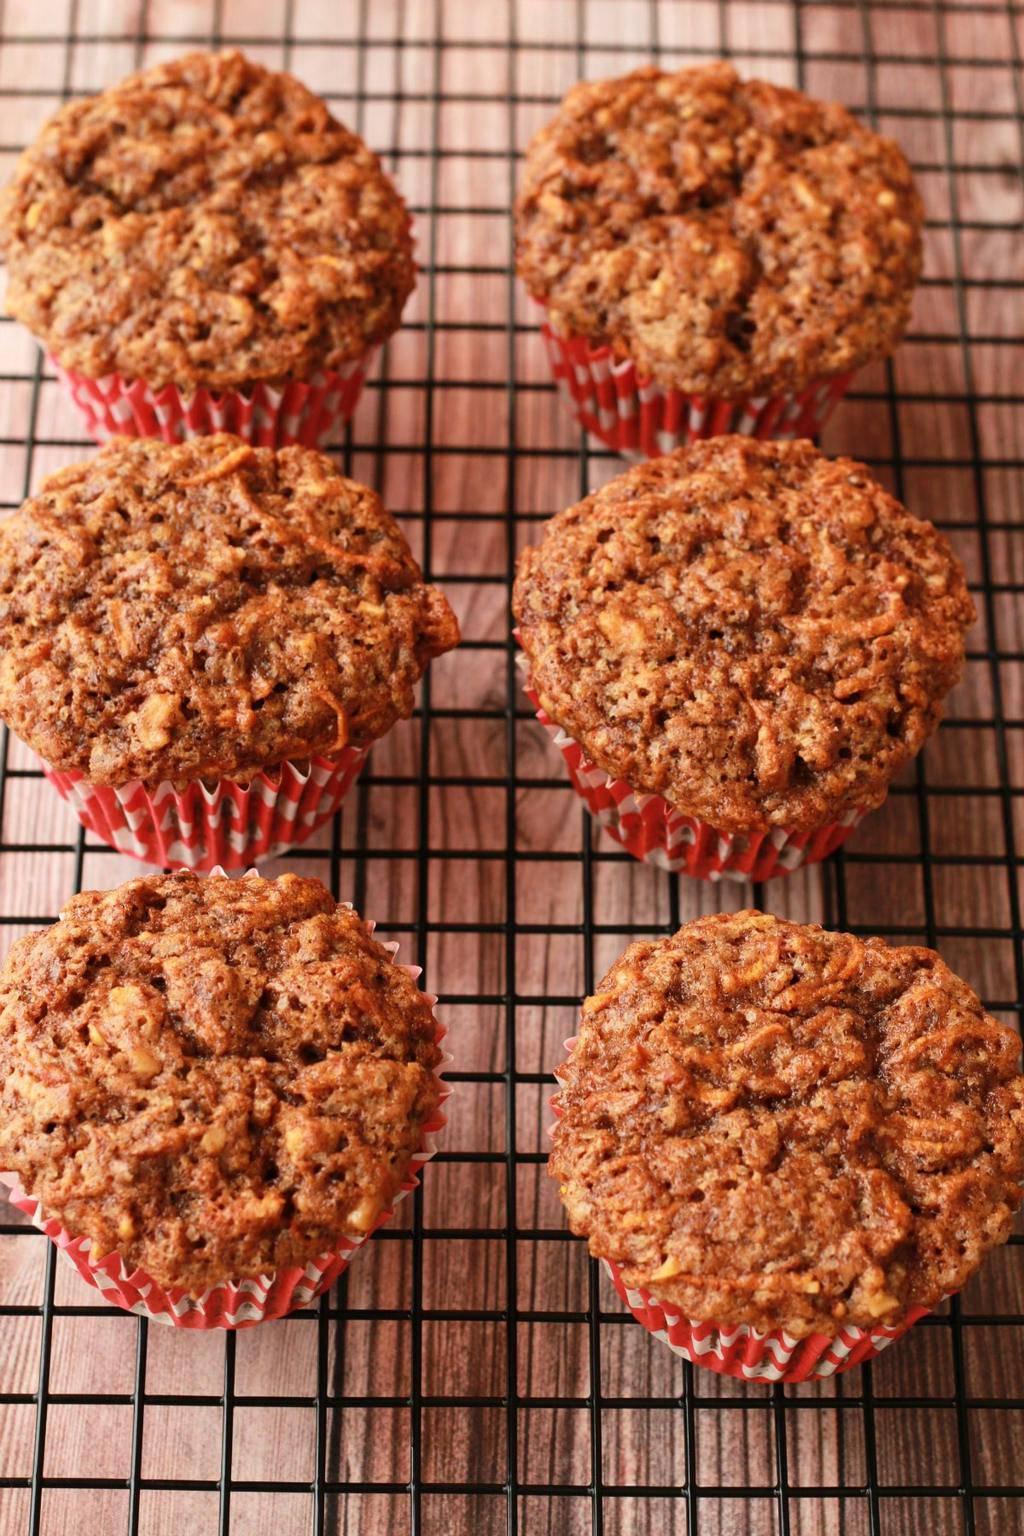 Vegan Carrot Cake Cupcakes with walnuts and orange zest. #vegan #lovingitvegan #carrotcakecupcakes #cupcakes #dessert